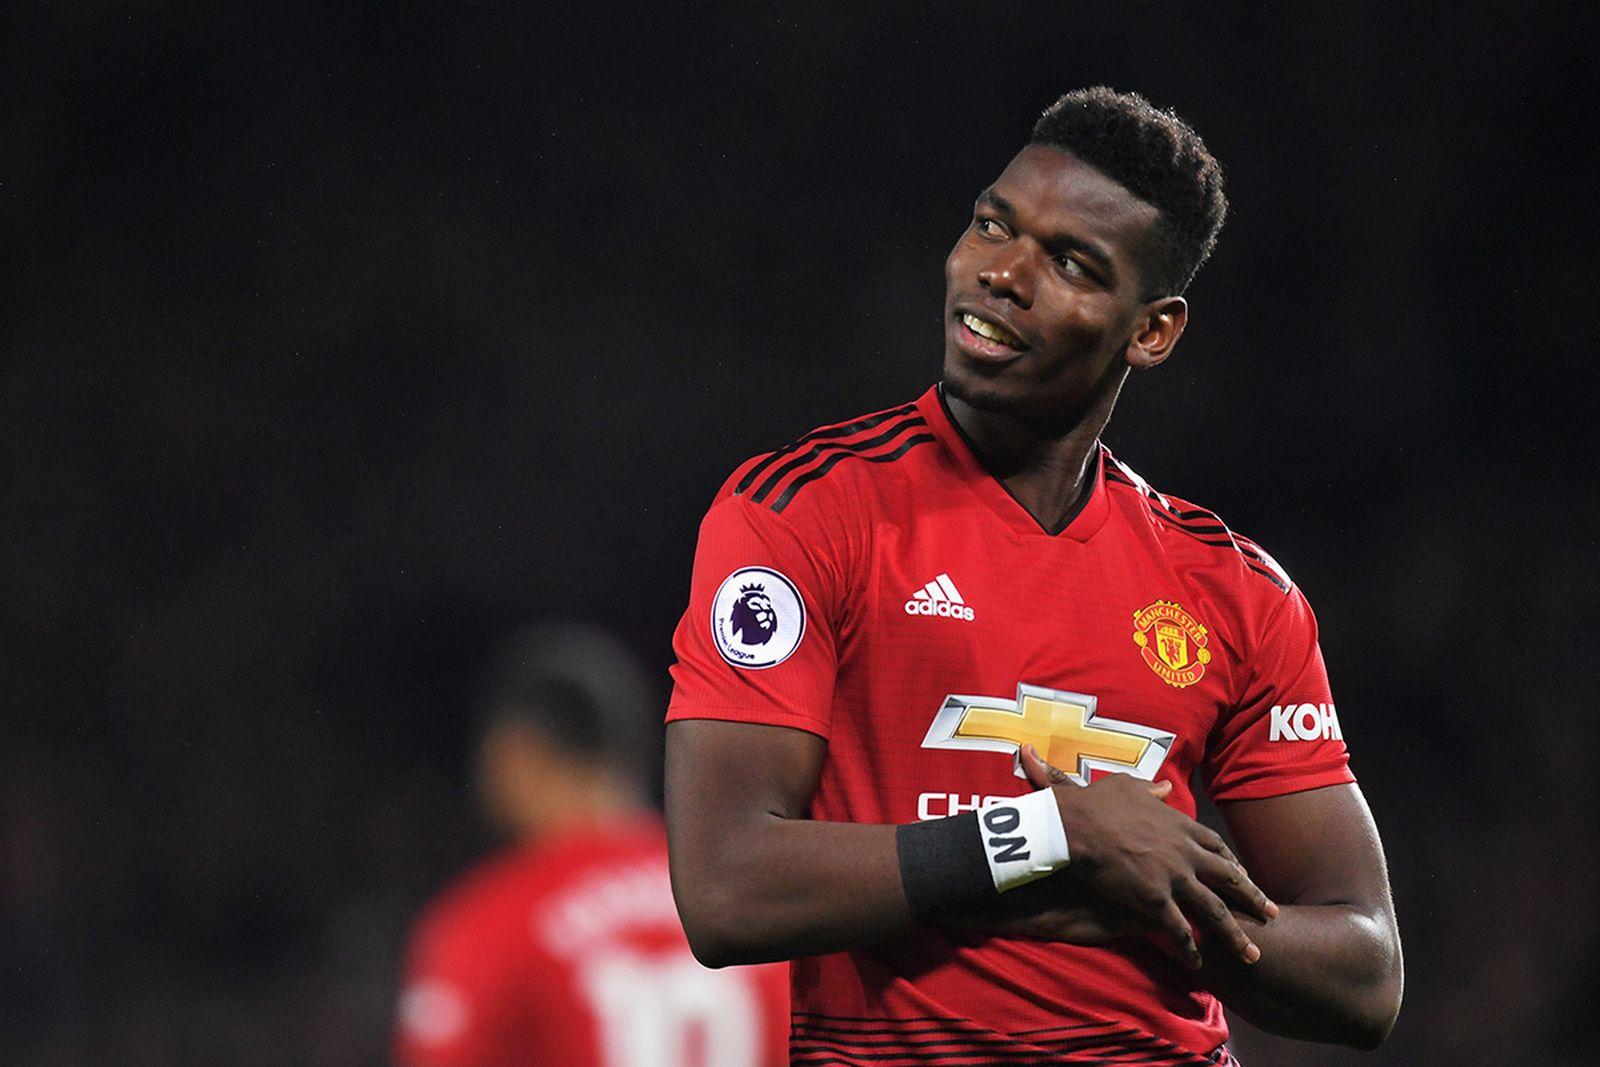 Paul Pogba of Manchester United celebrates scoring a goal